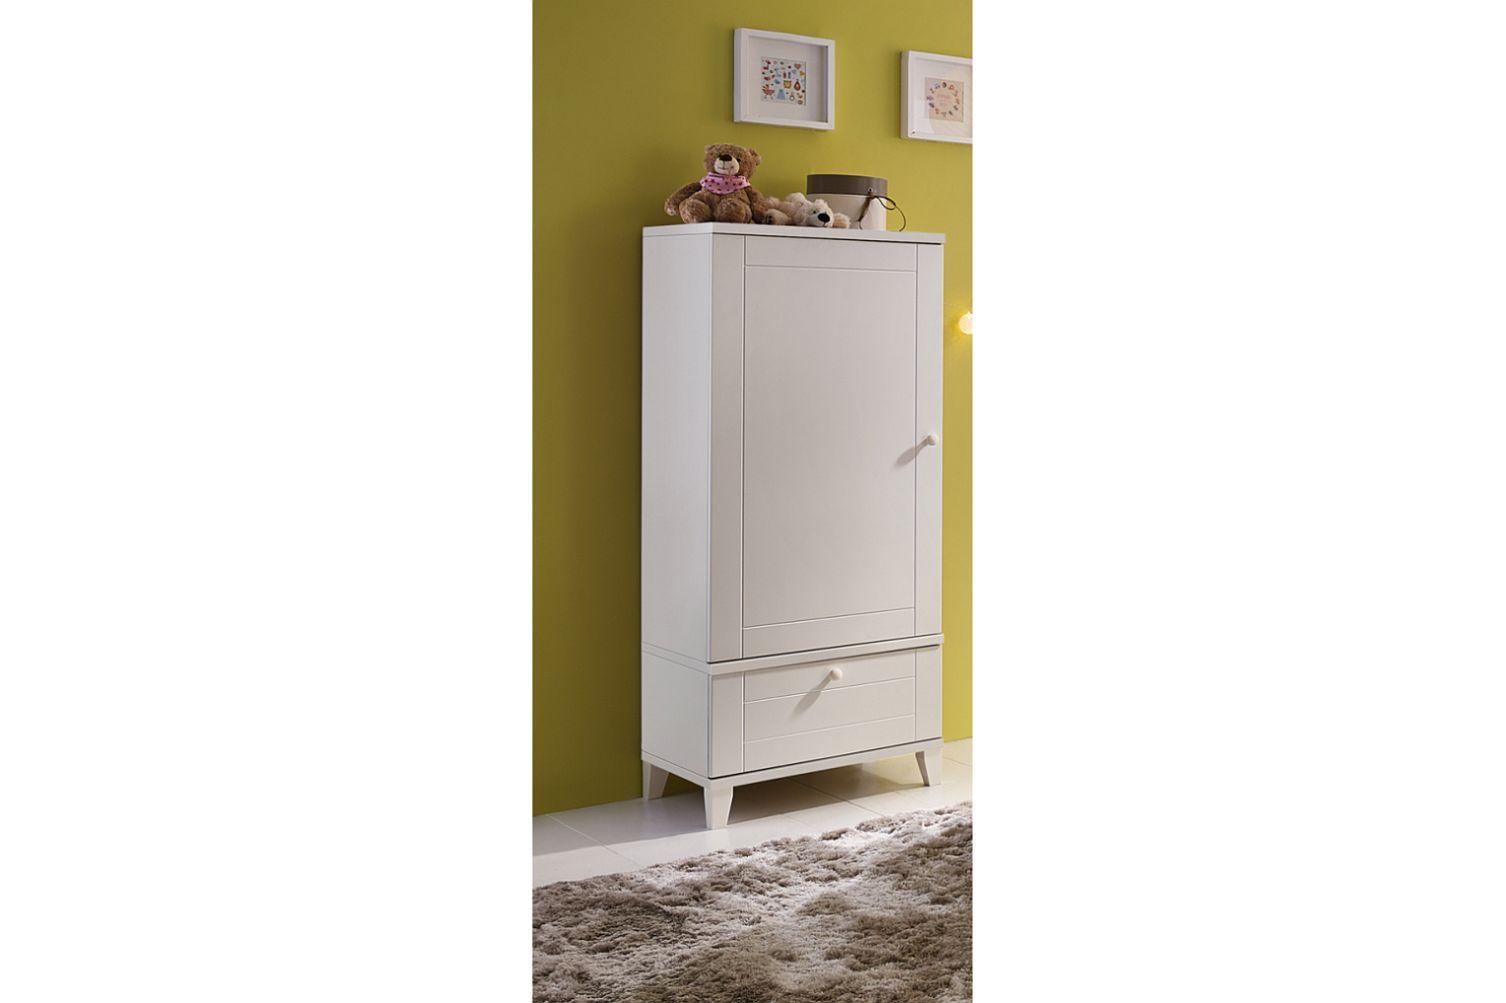 kommode bella 0484 11 weiss matt online kaufen. Black Bedroom Furniture Sets. Home Design Ideas